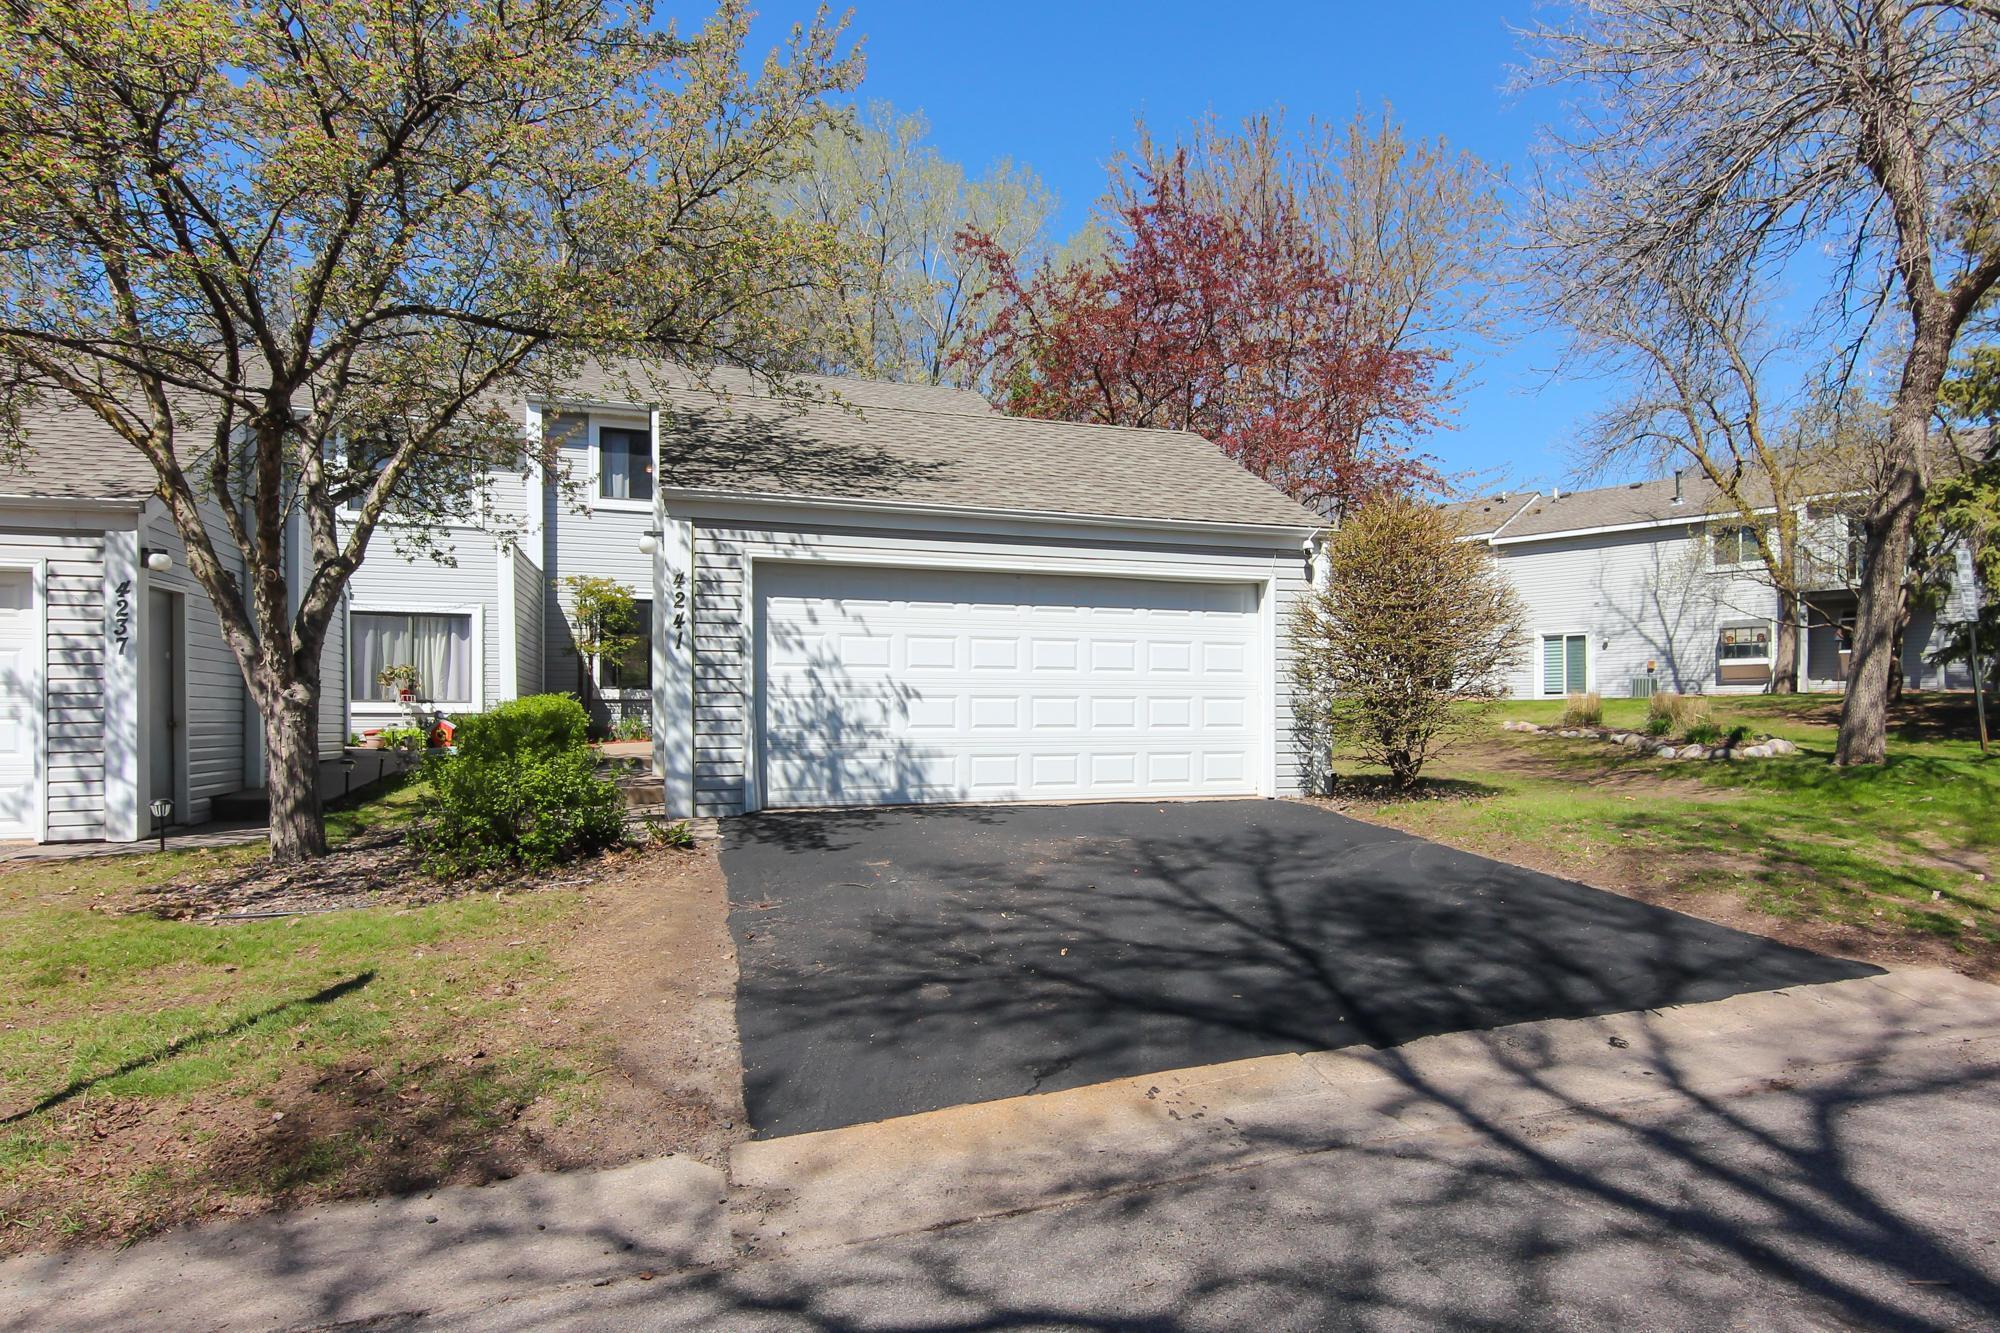 4241 Sylvia Lane N, Shoreview, Minnesota 55126, 2 Bedrooms Bedrooms, ,2 BathroomsBathrooms,Townhouse,For Sale,4241 Sylvia Lane N,5749833